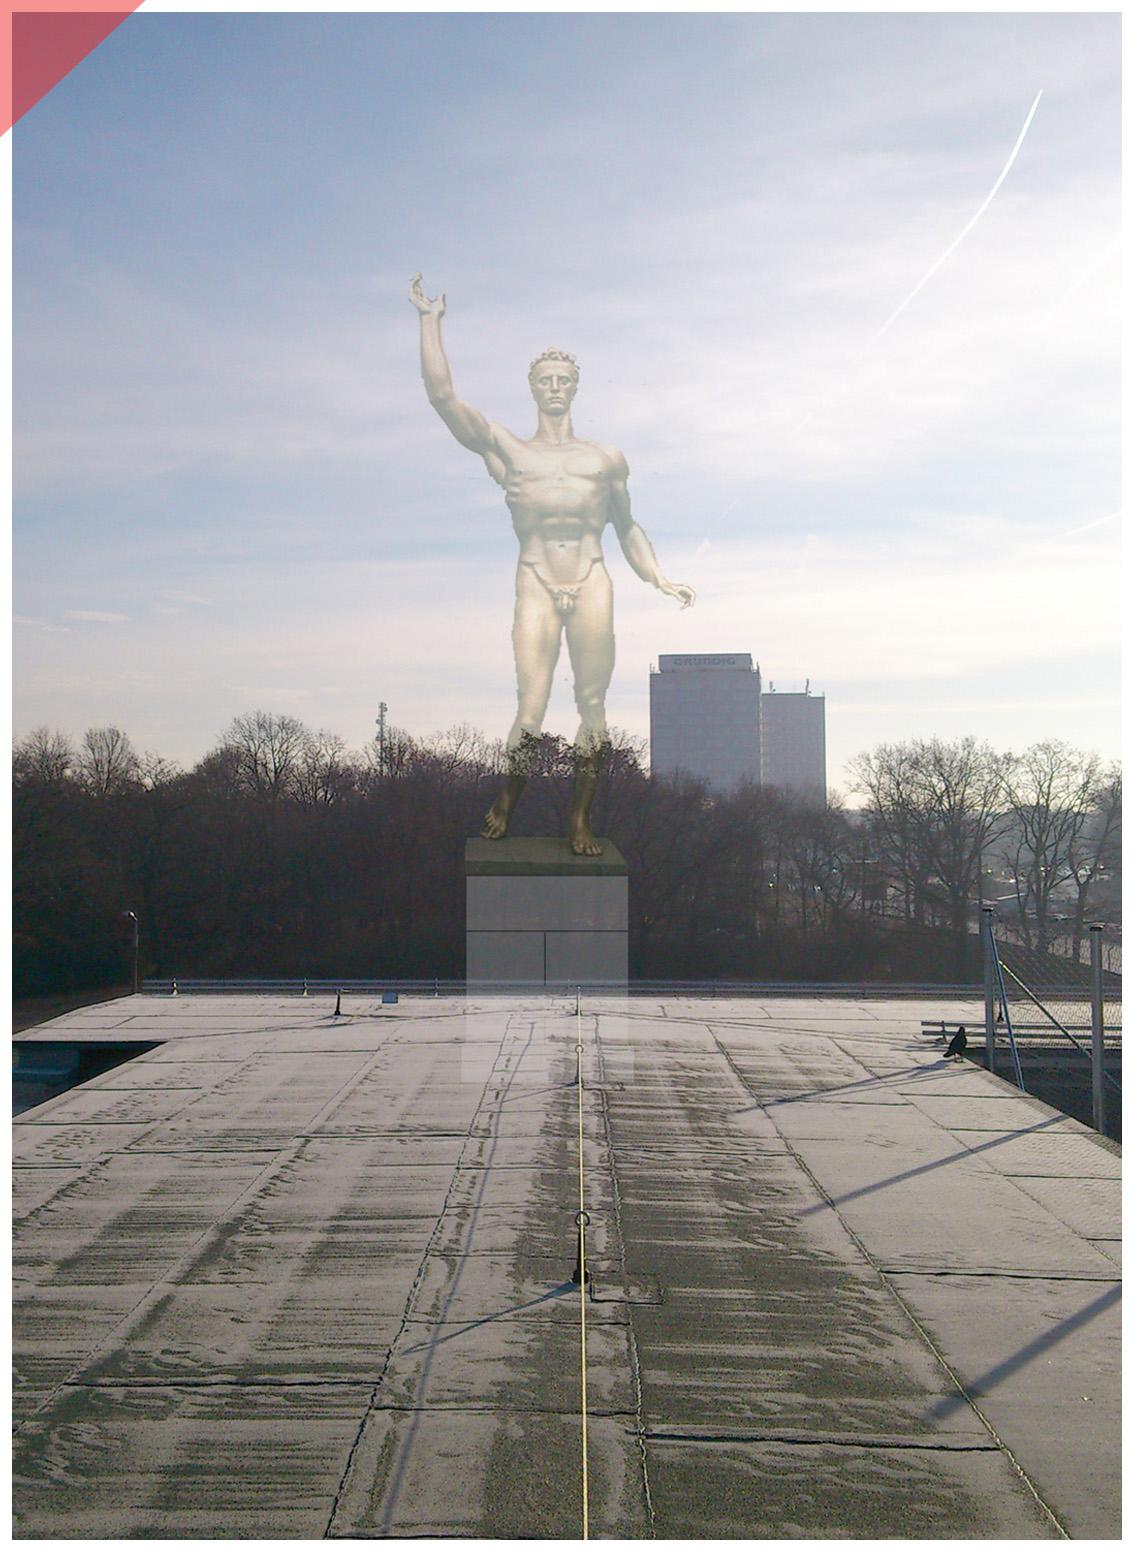 Zeppelin-field-grandstand-Nuremberg-sculptures-planned-figurine-Arno-Breker-1939-Seer-Readieness